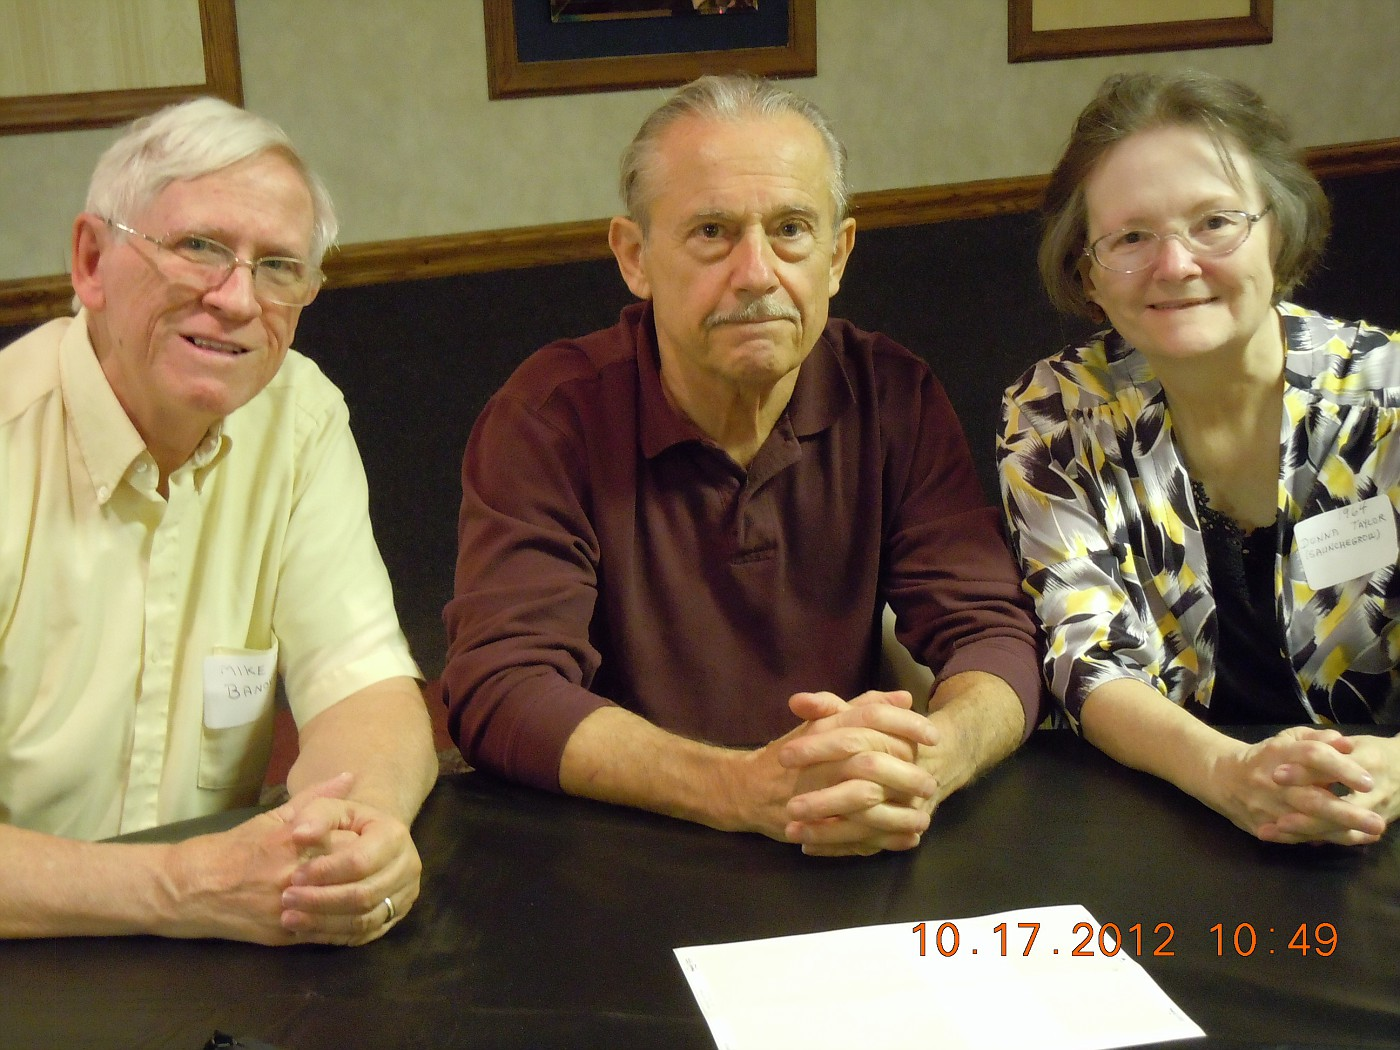 Mike Banovz, Dan Verlinick, Donna Taylor